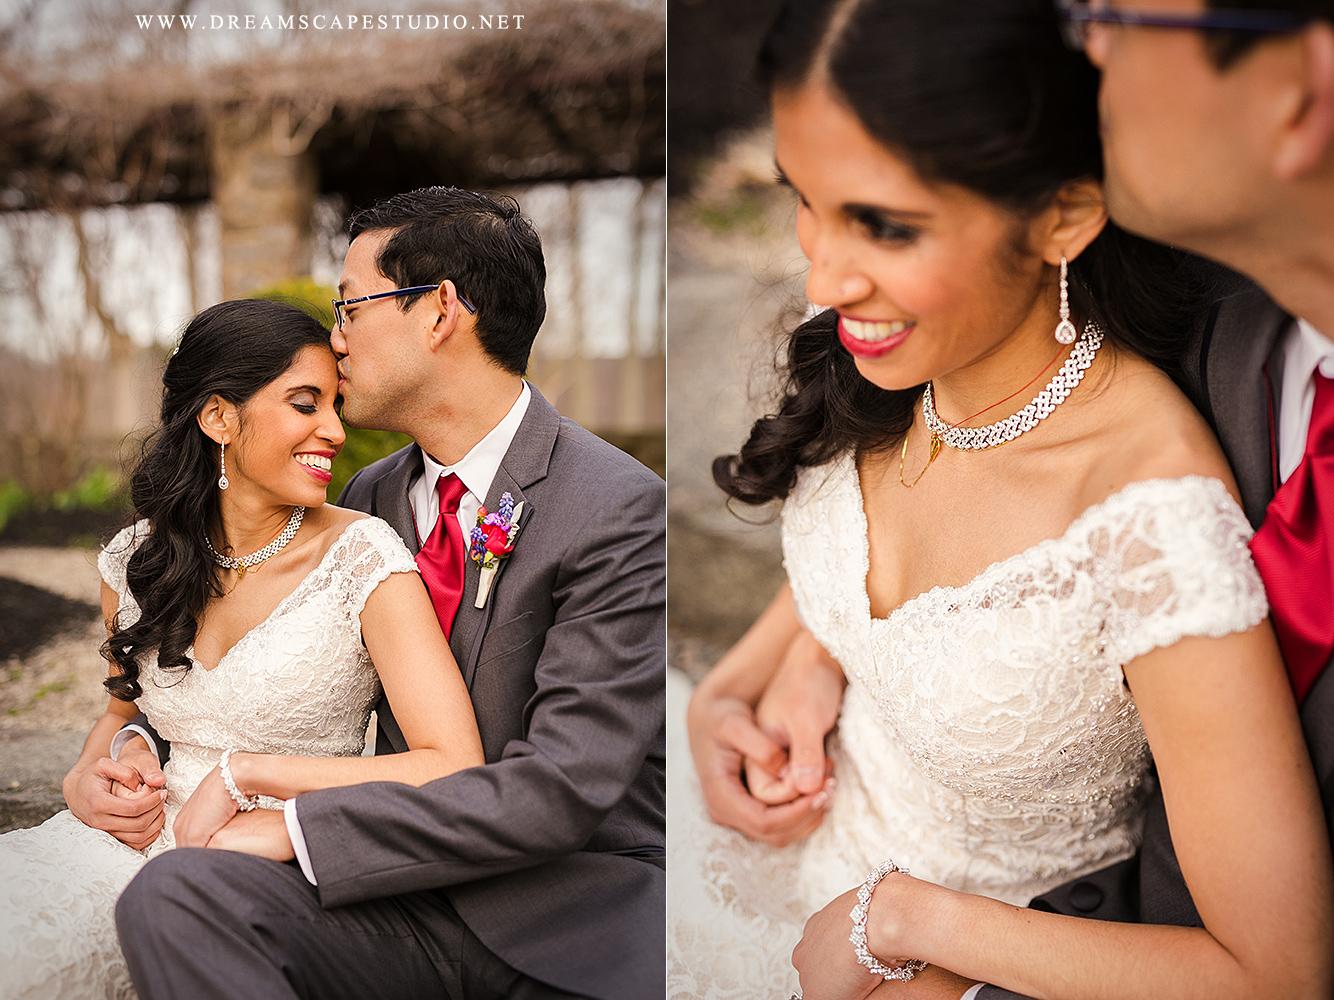 CT_Wedding_Photographer_PaHe_Blog_30.jpg